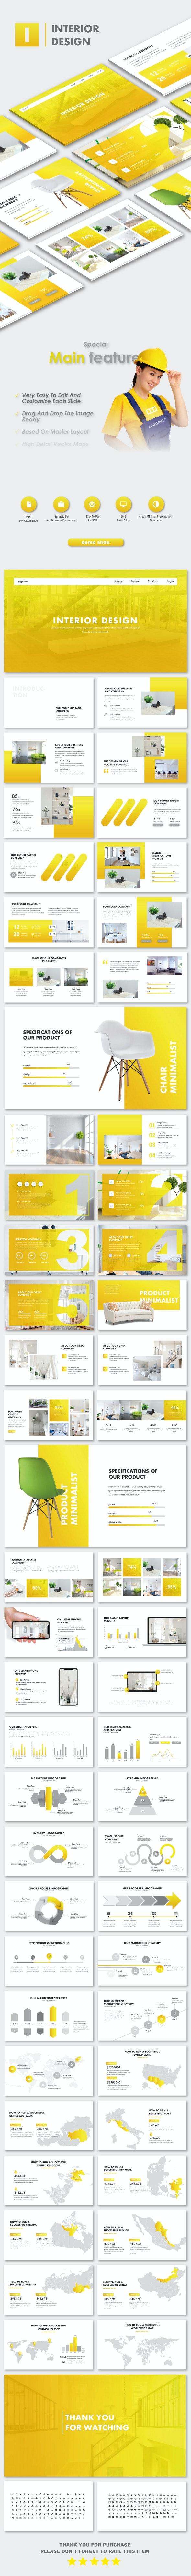 Interior Design Google Slide Templates - Google Slides Presentation Templates